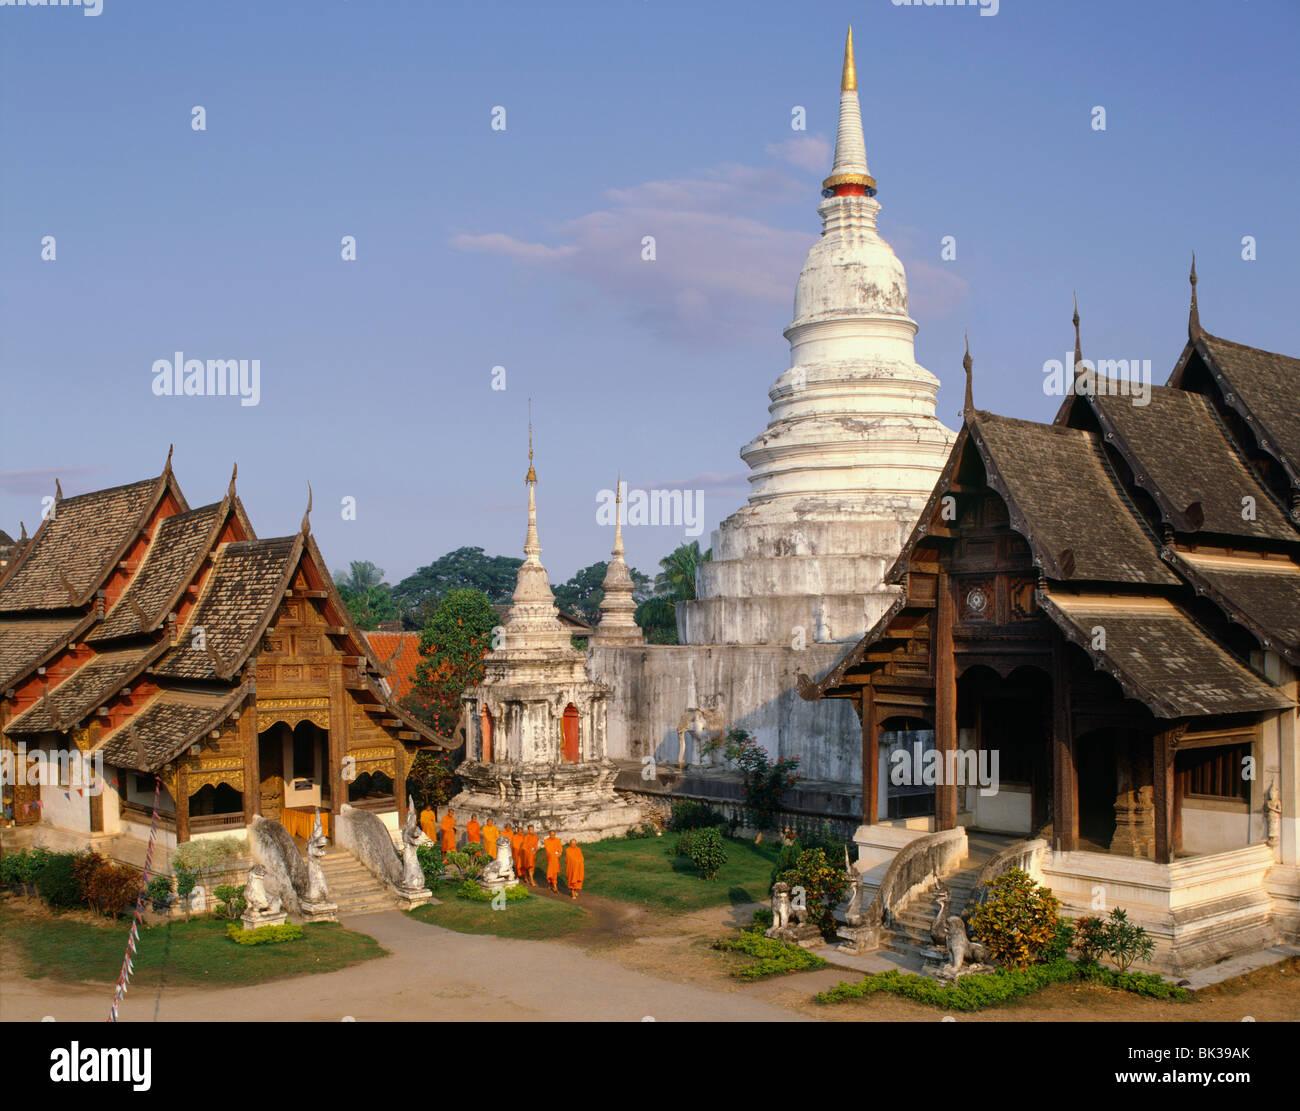 Wat Phra Singh, Chiang Mai, Thailand, Southeast Asia, Asia Stock Photo